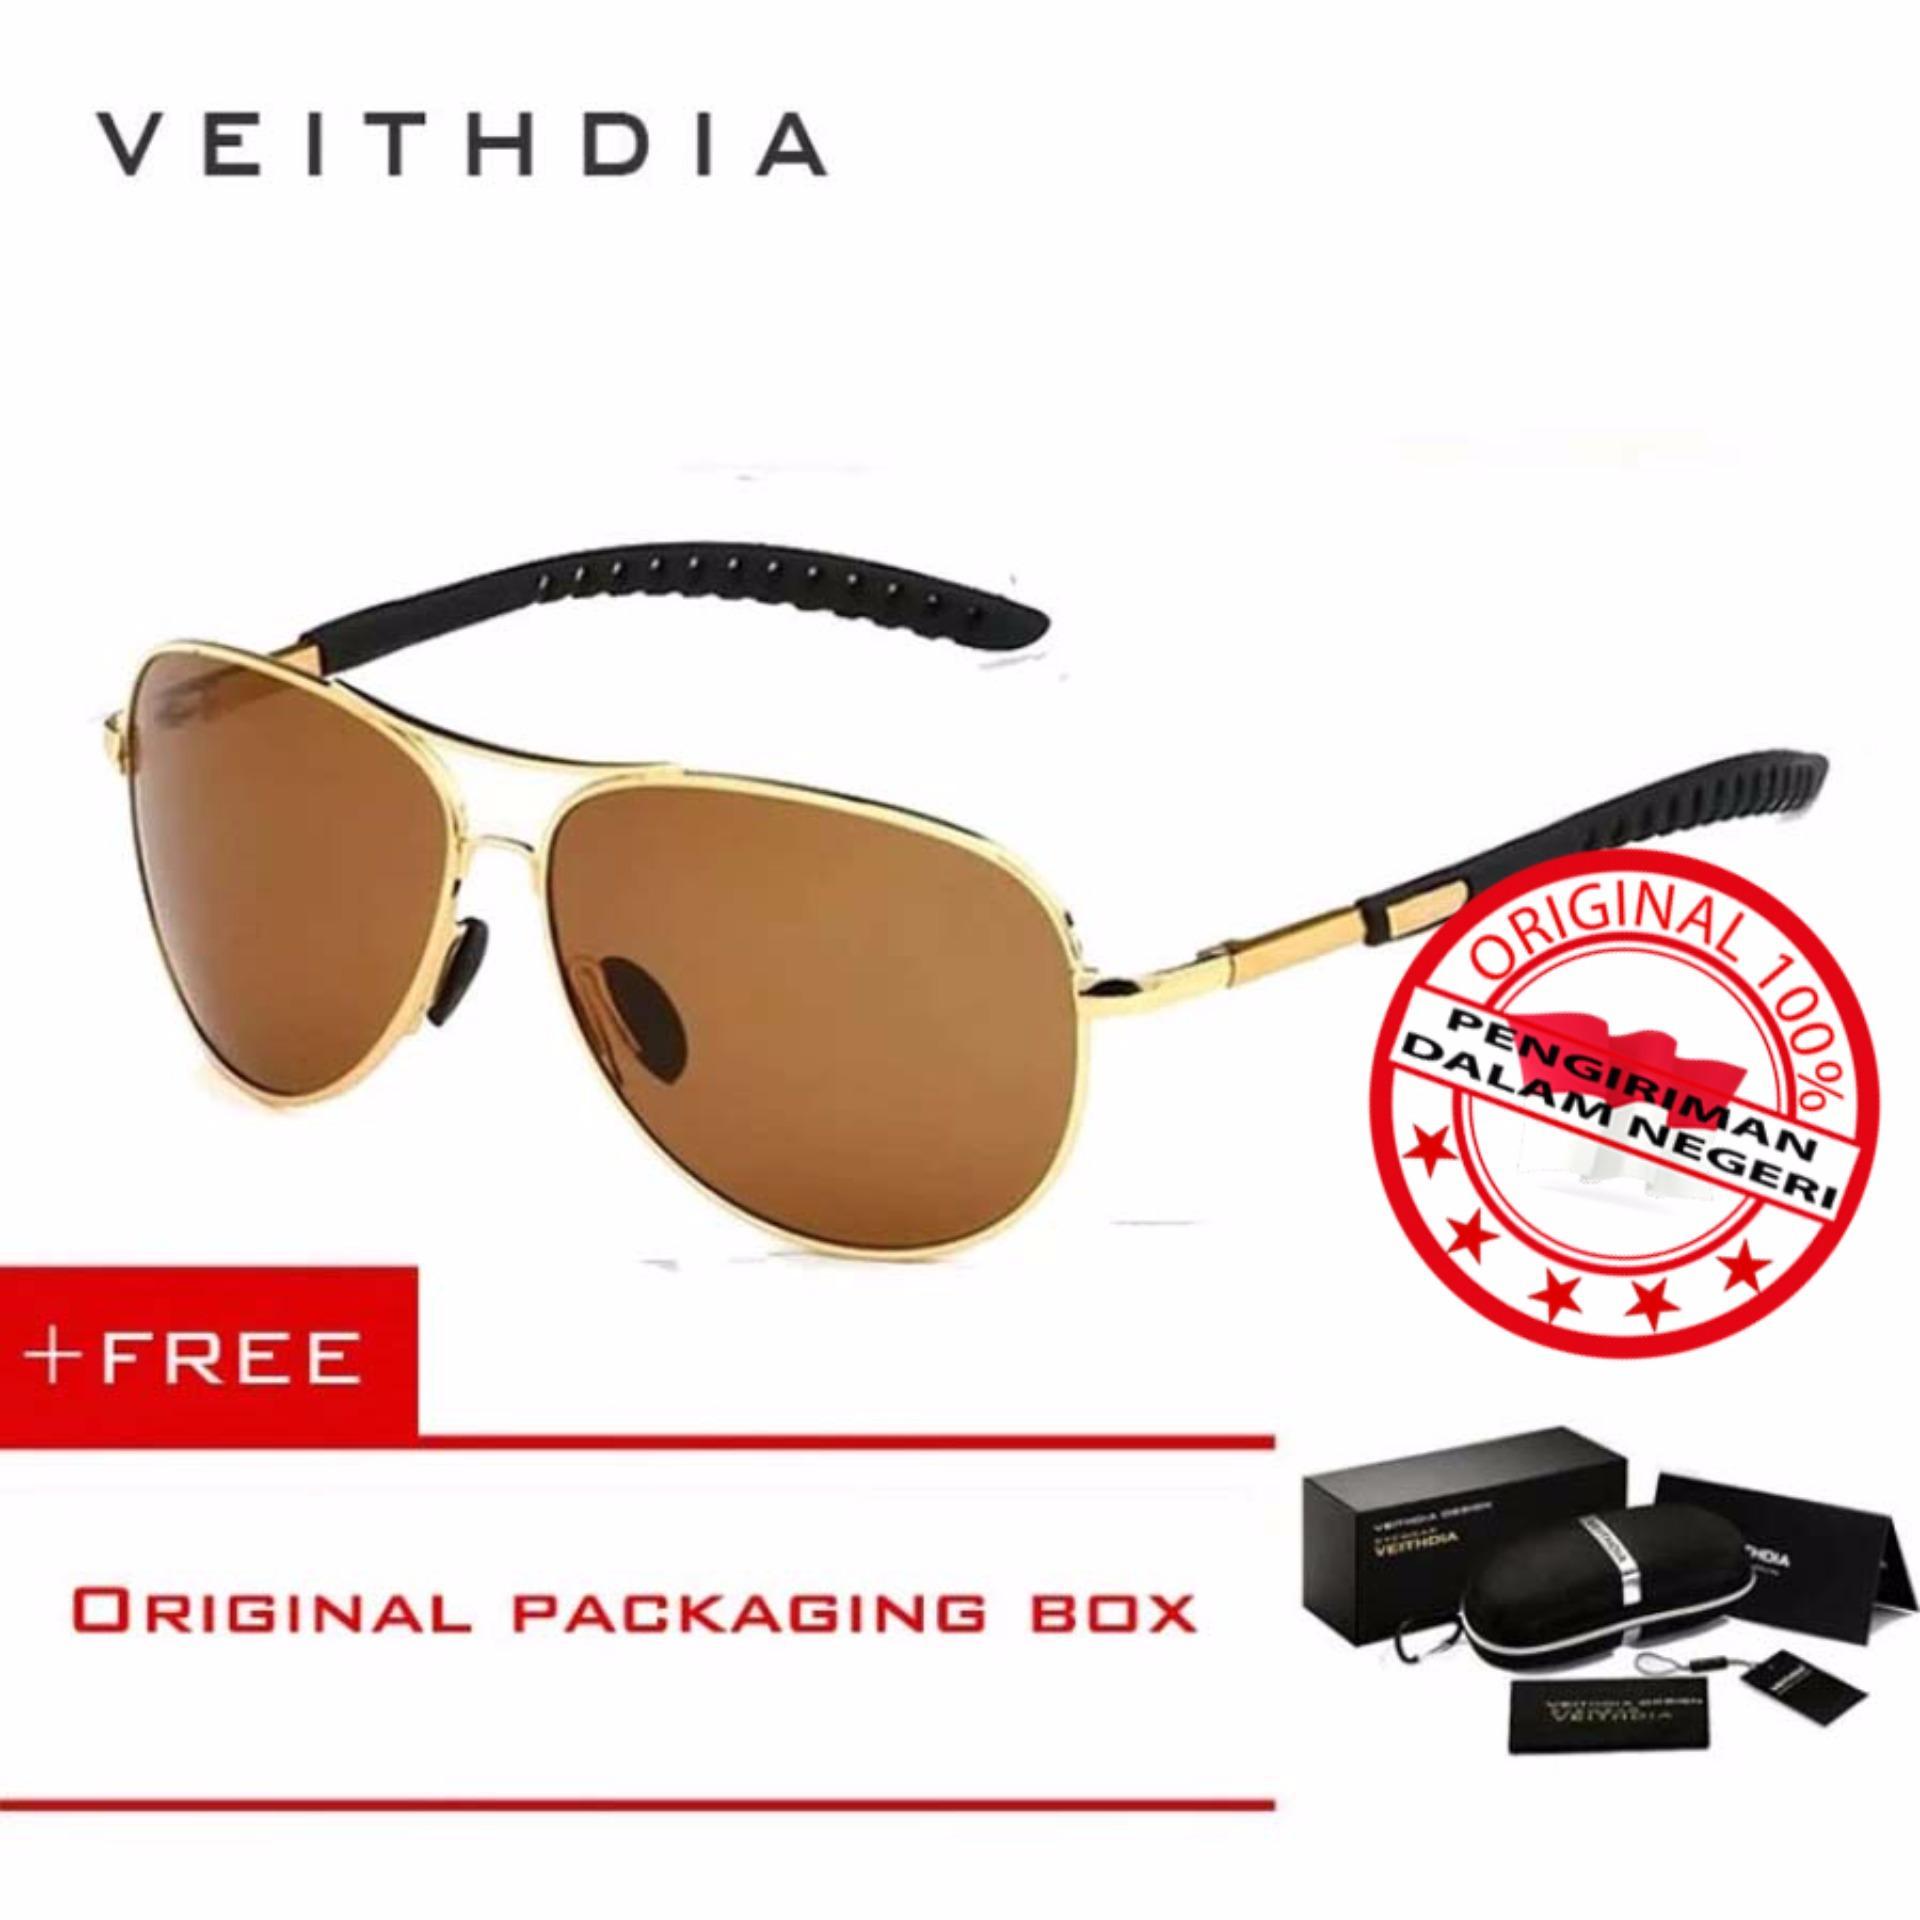 Veithdia Kacamata Pria Hitam Aluminium Sport Dan Travel Elegant Mirrored Uv400 Polarized Sunglasses 3088 Free Kotak Hardcase Diskon Indonesia